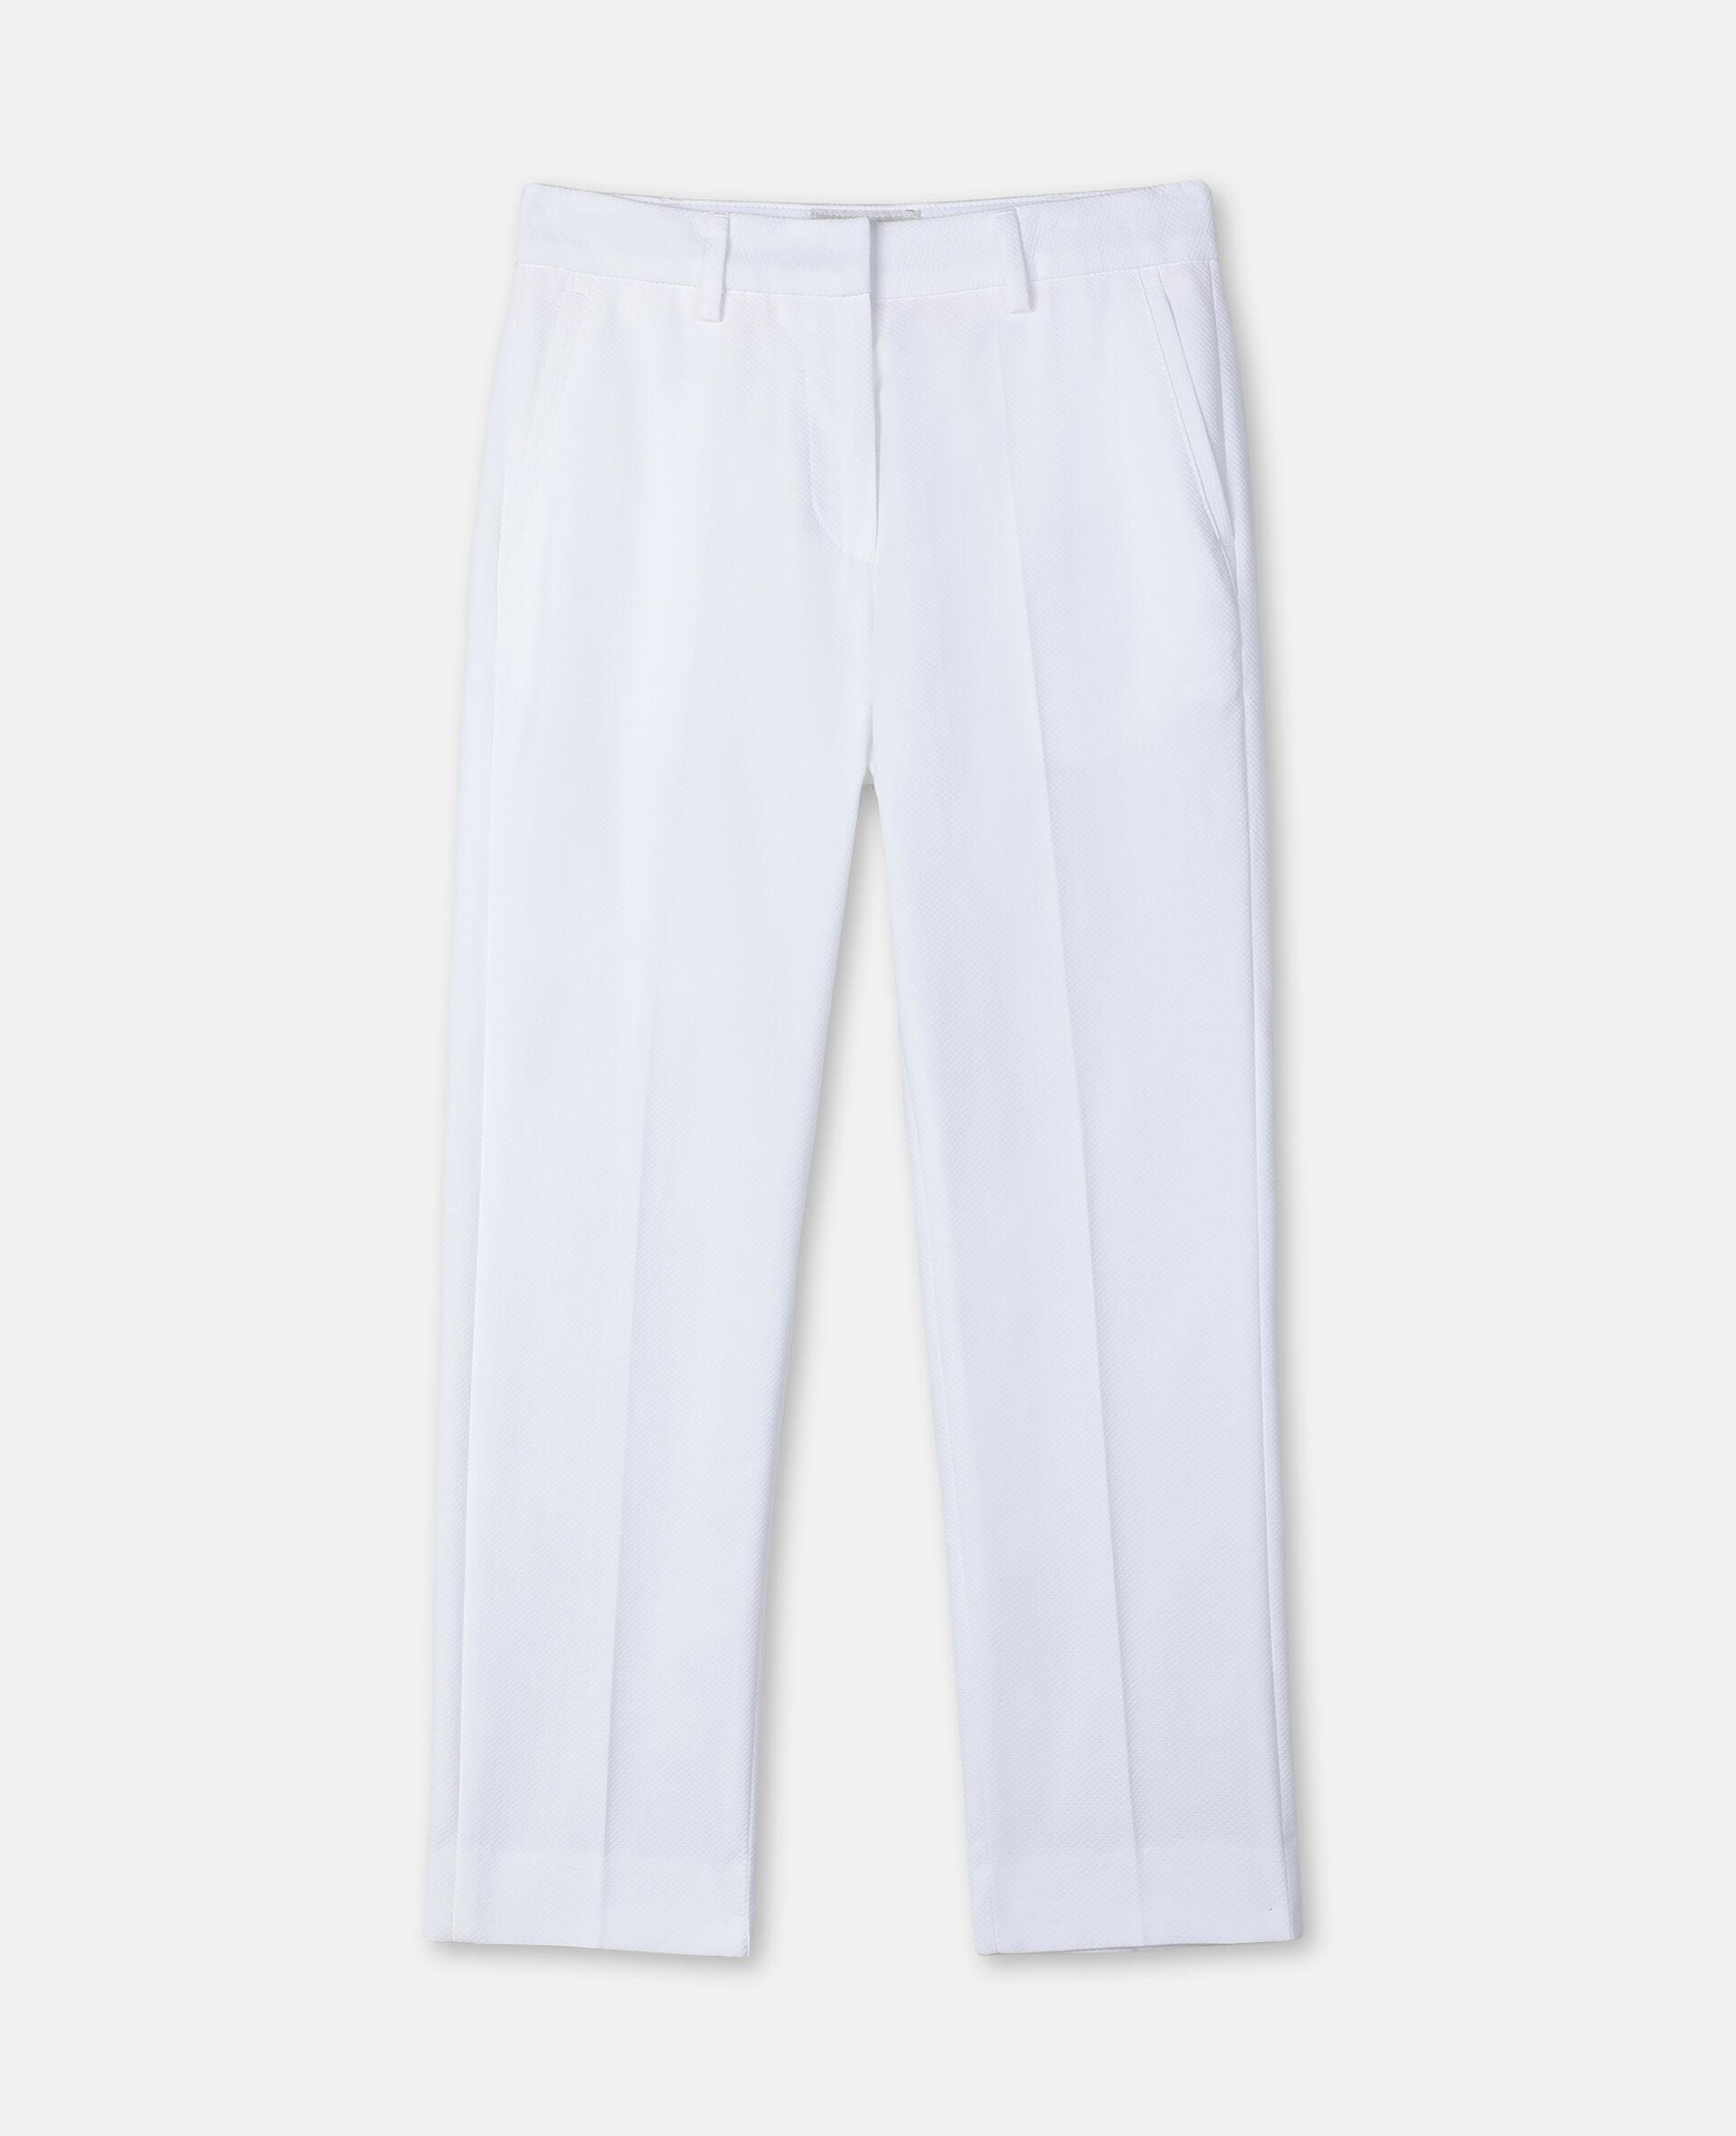 Anzughose aus Baumwoll-Pikee-Weiß-large image number 0